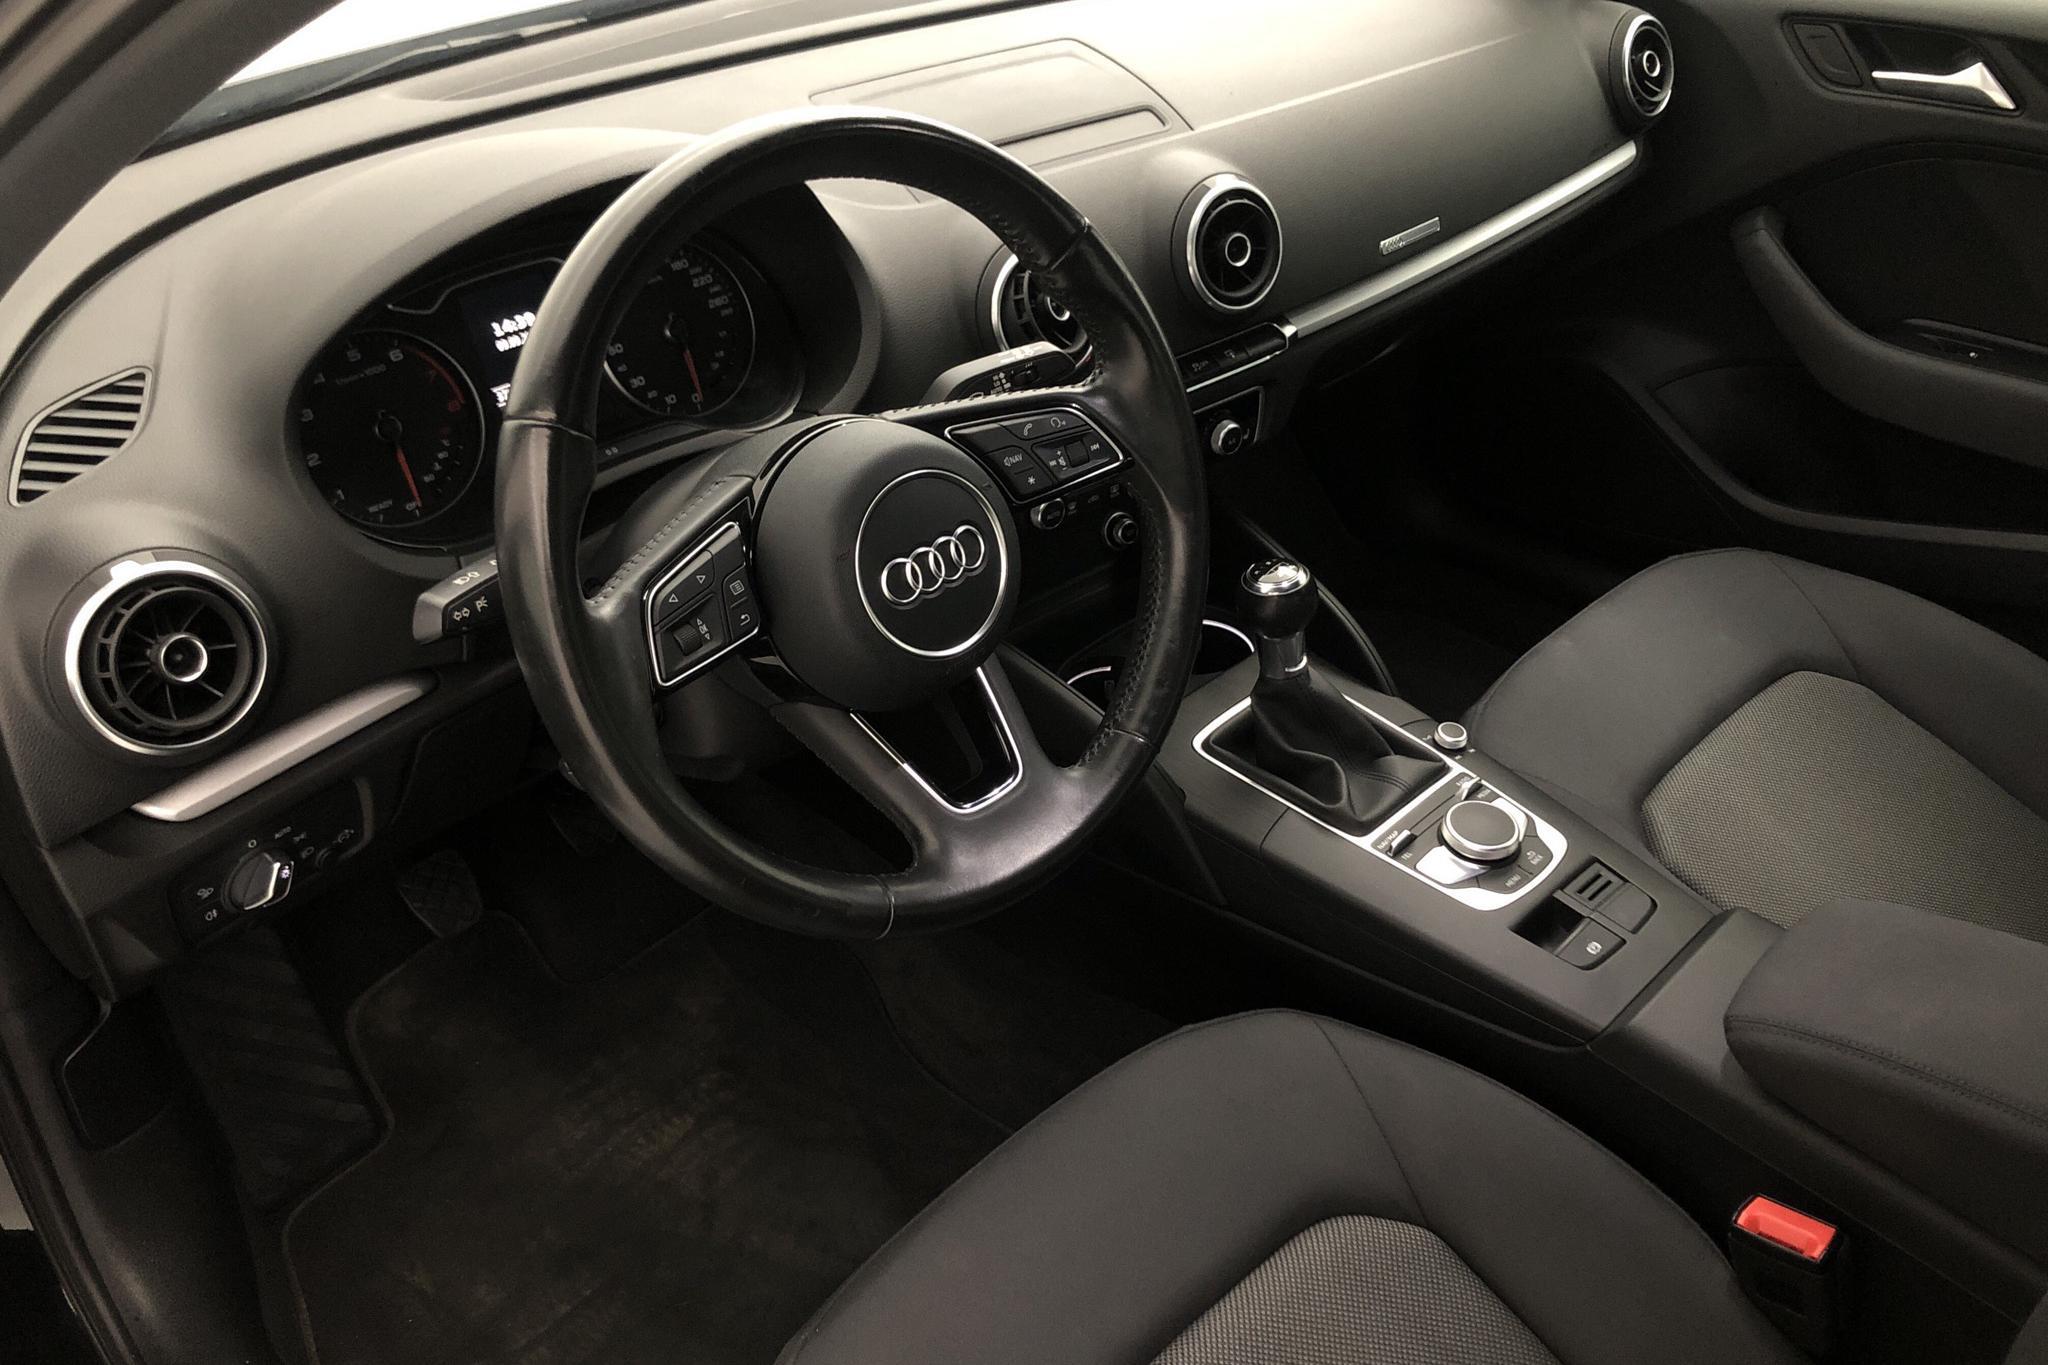 Audi A3 1.0 TFSI Sportback (116hk) - 3 768 mil - Manuell - svart - 2017